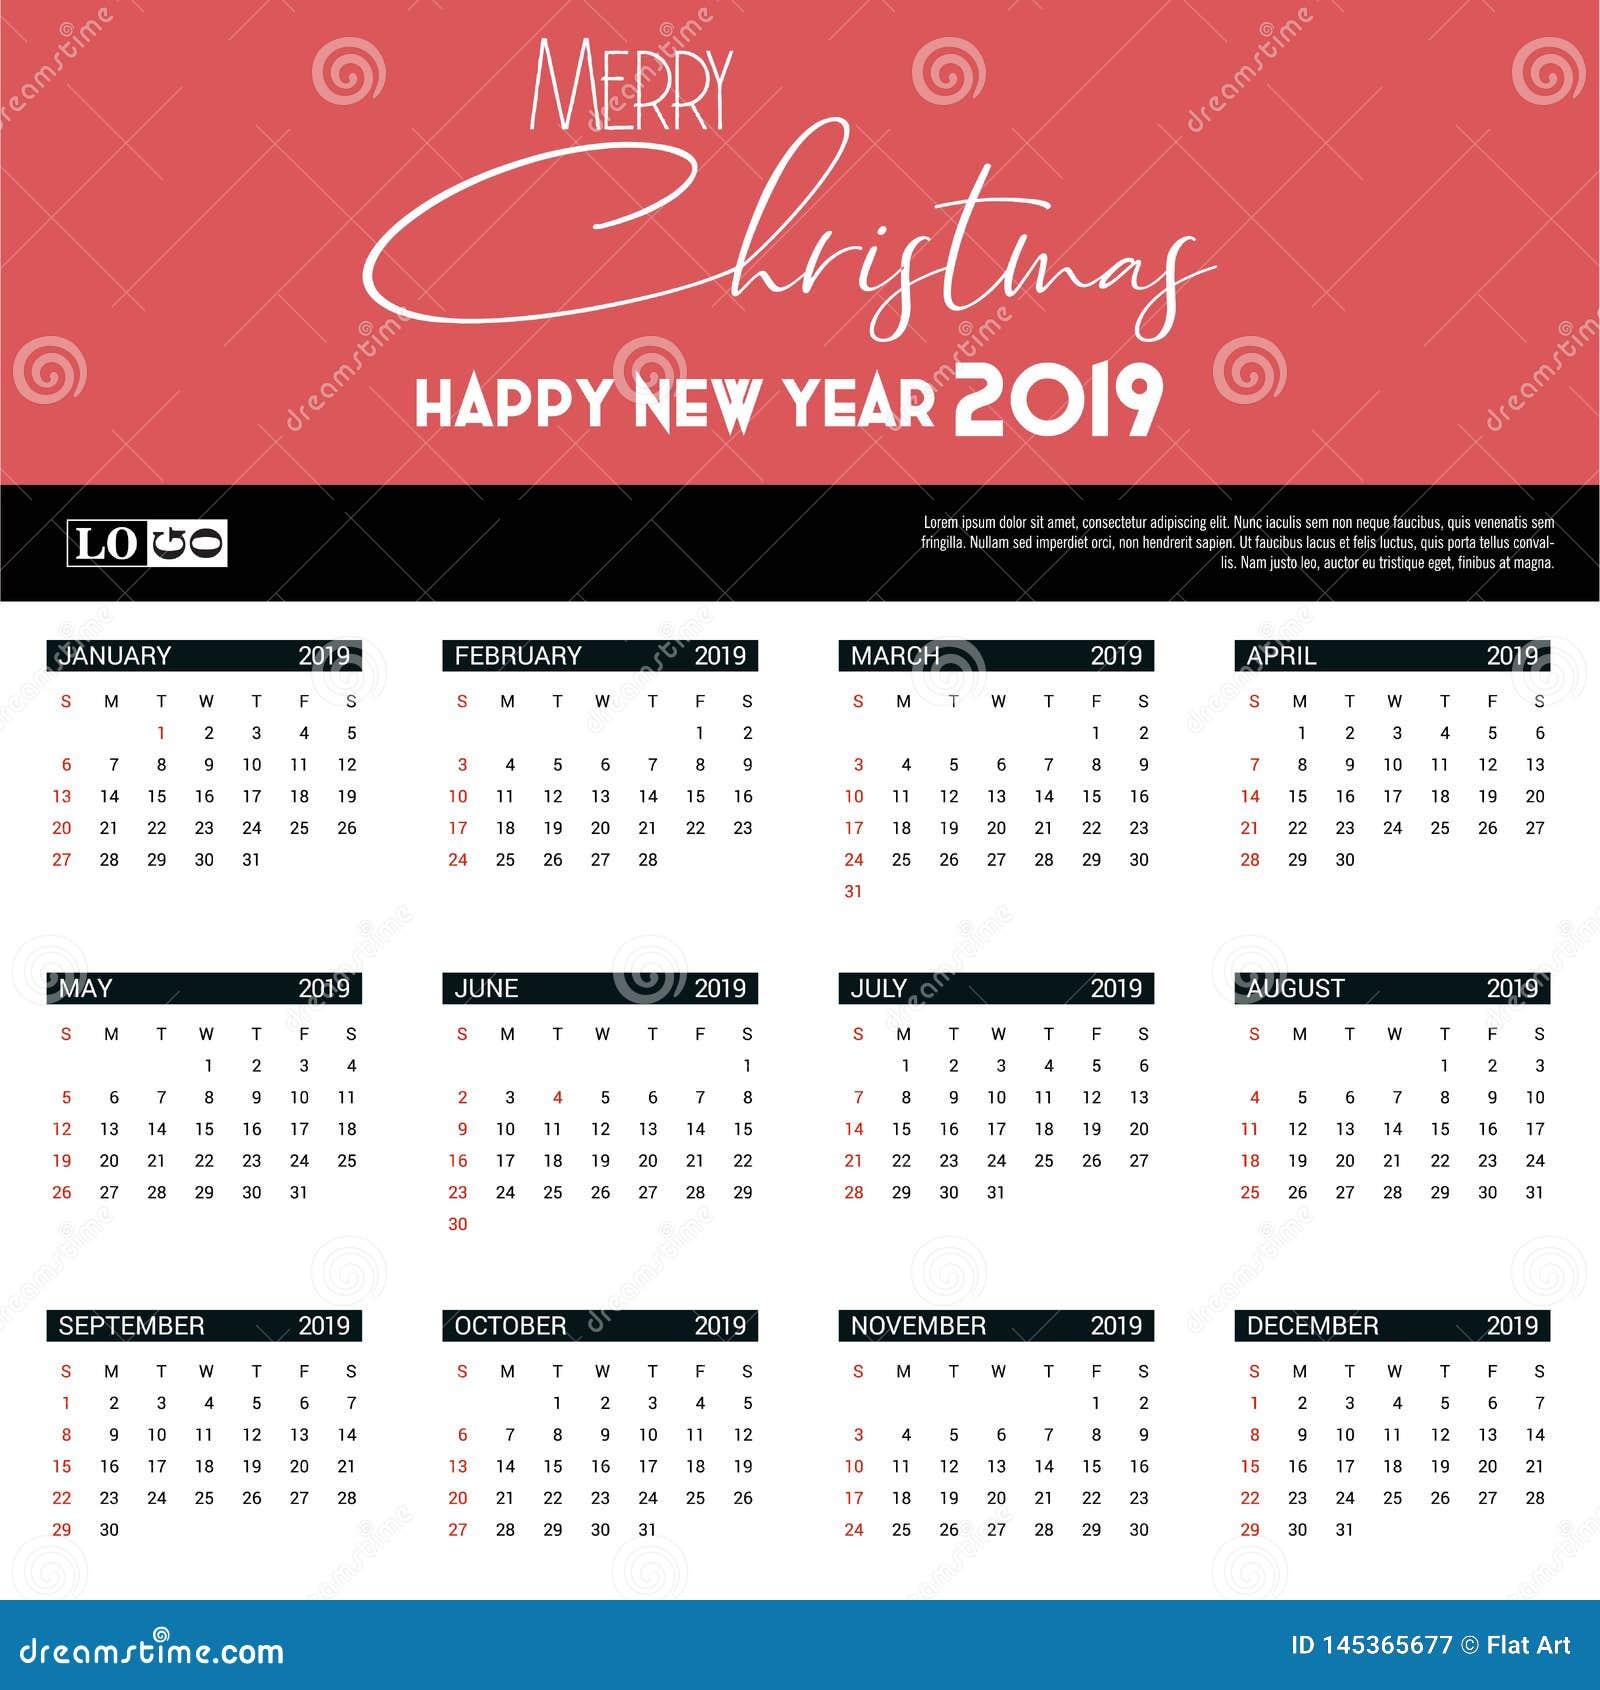 Christmas 2019 Calendar.2019 Calendar Template Christmas And Happy New Year